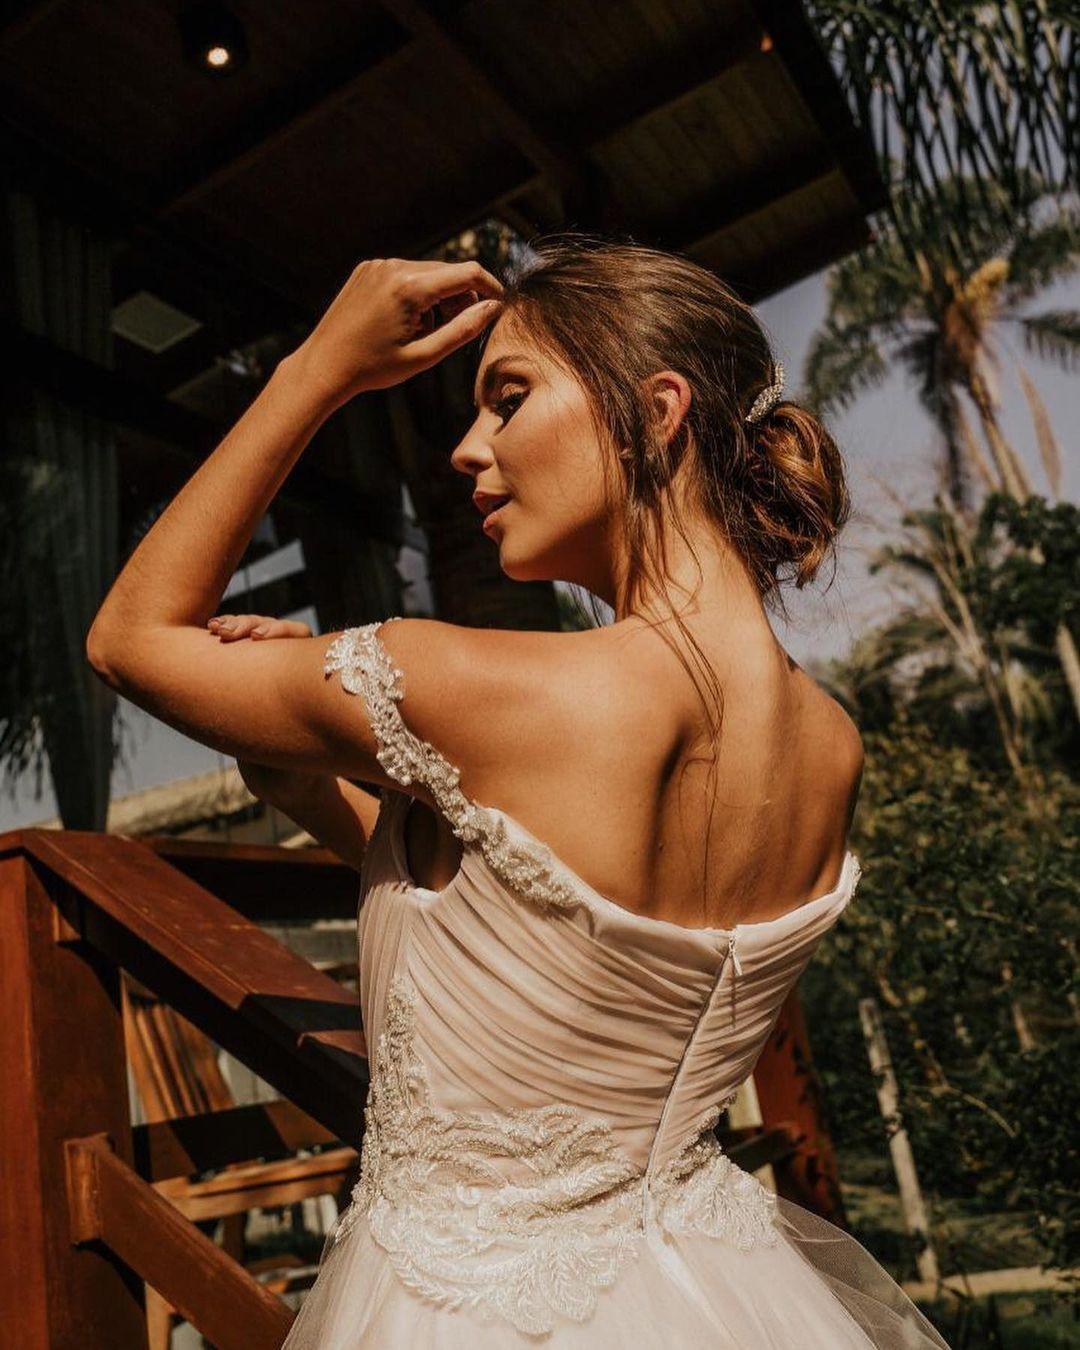 ana flavia giacomini, miss ilha dos lobos mundo 2019. - Página 3 Fvkxog10